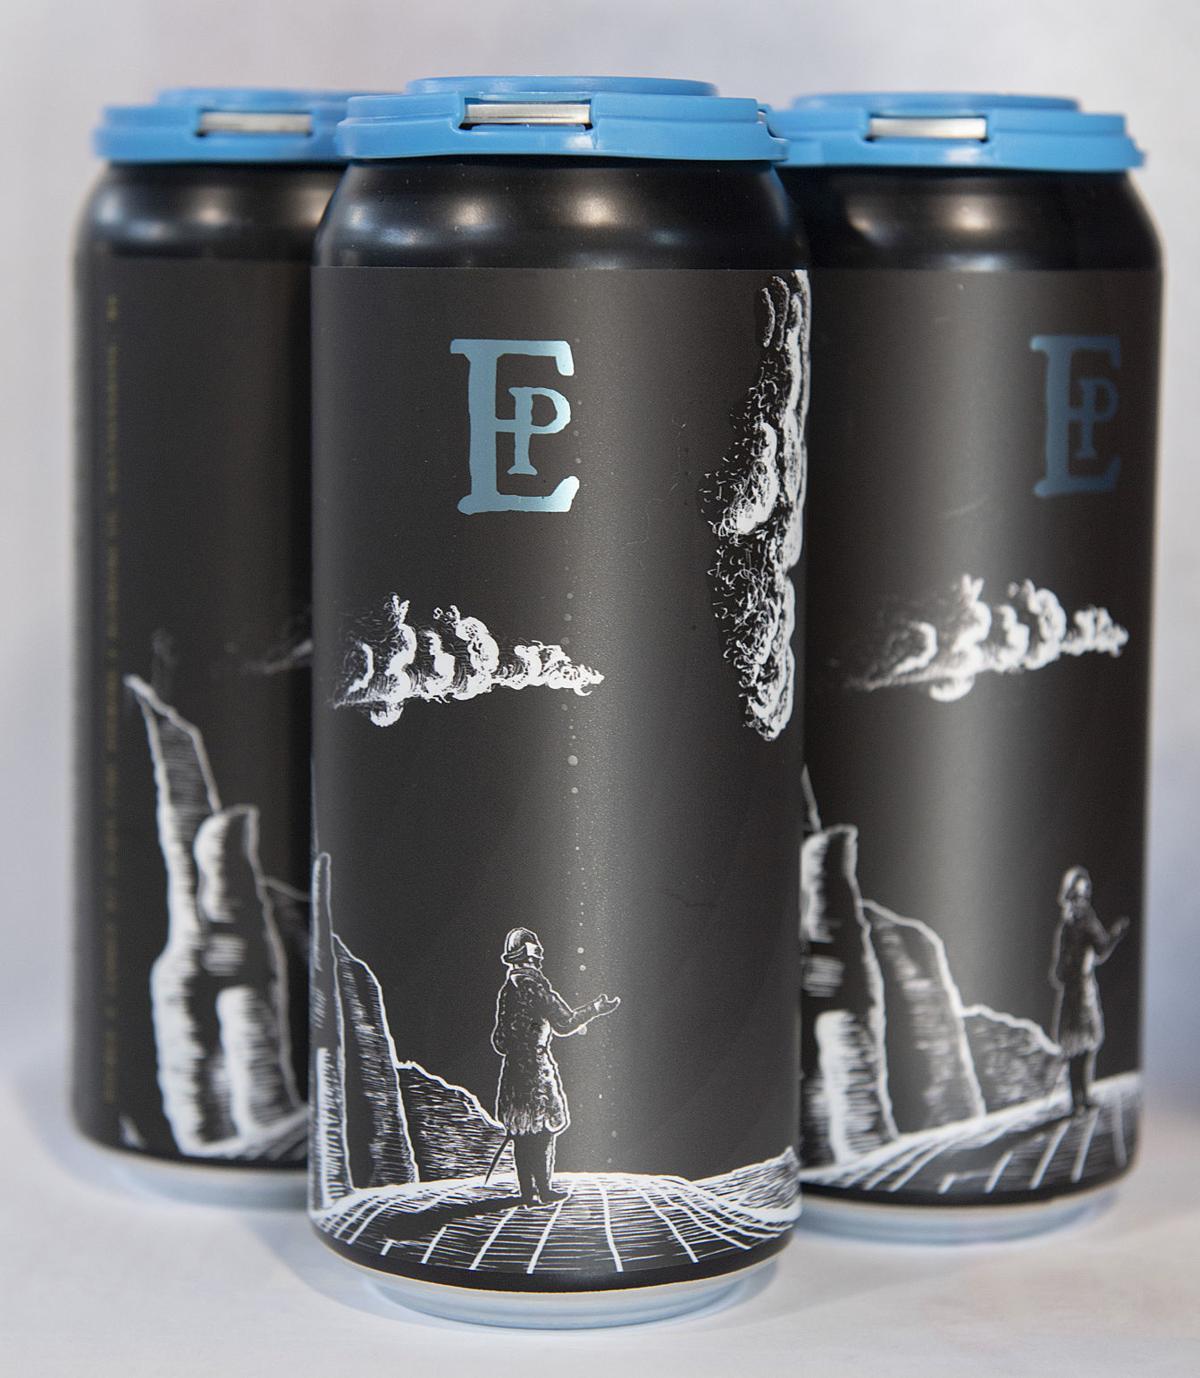 District East Beer